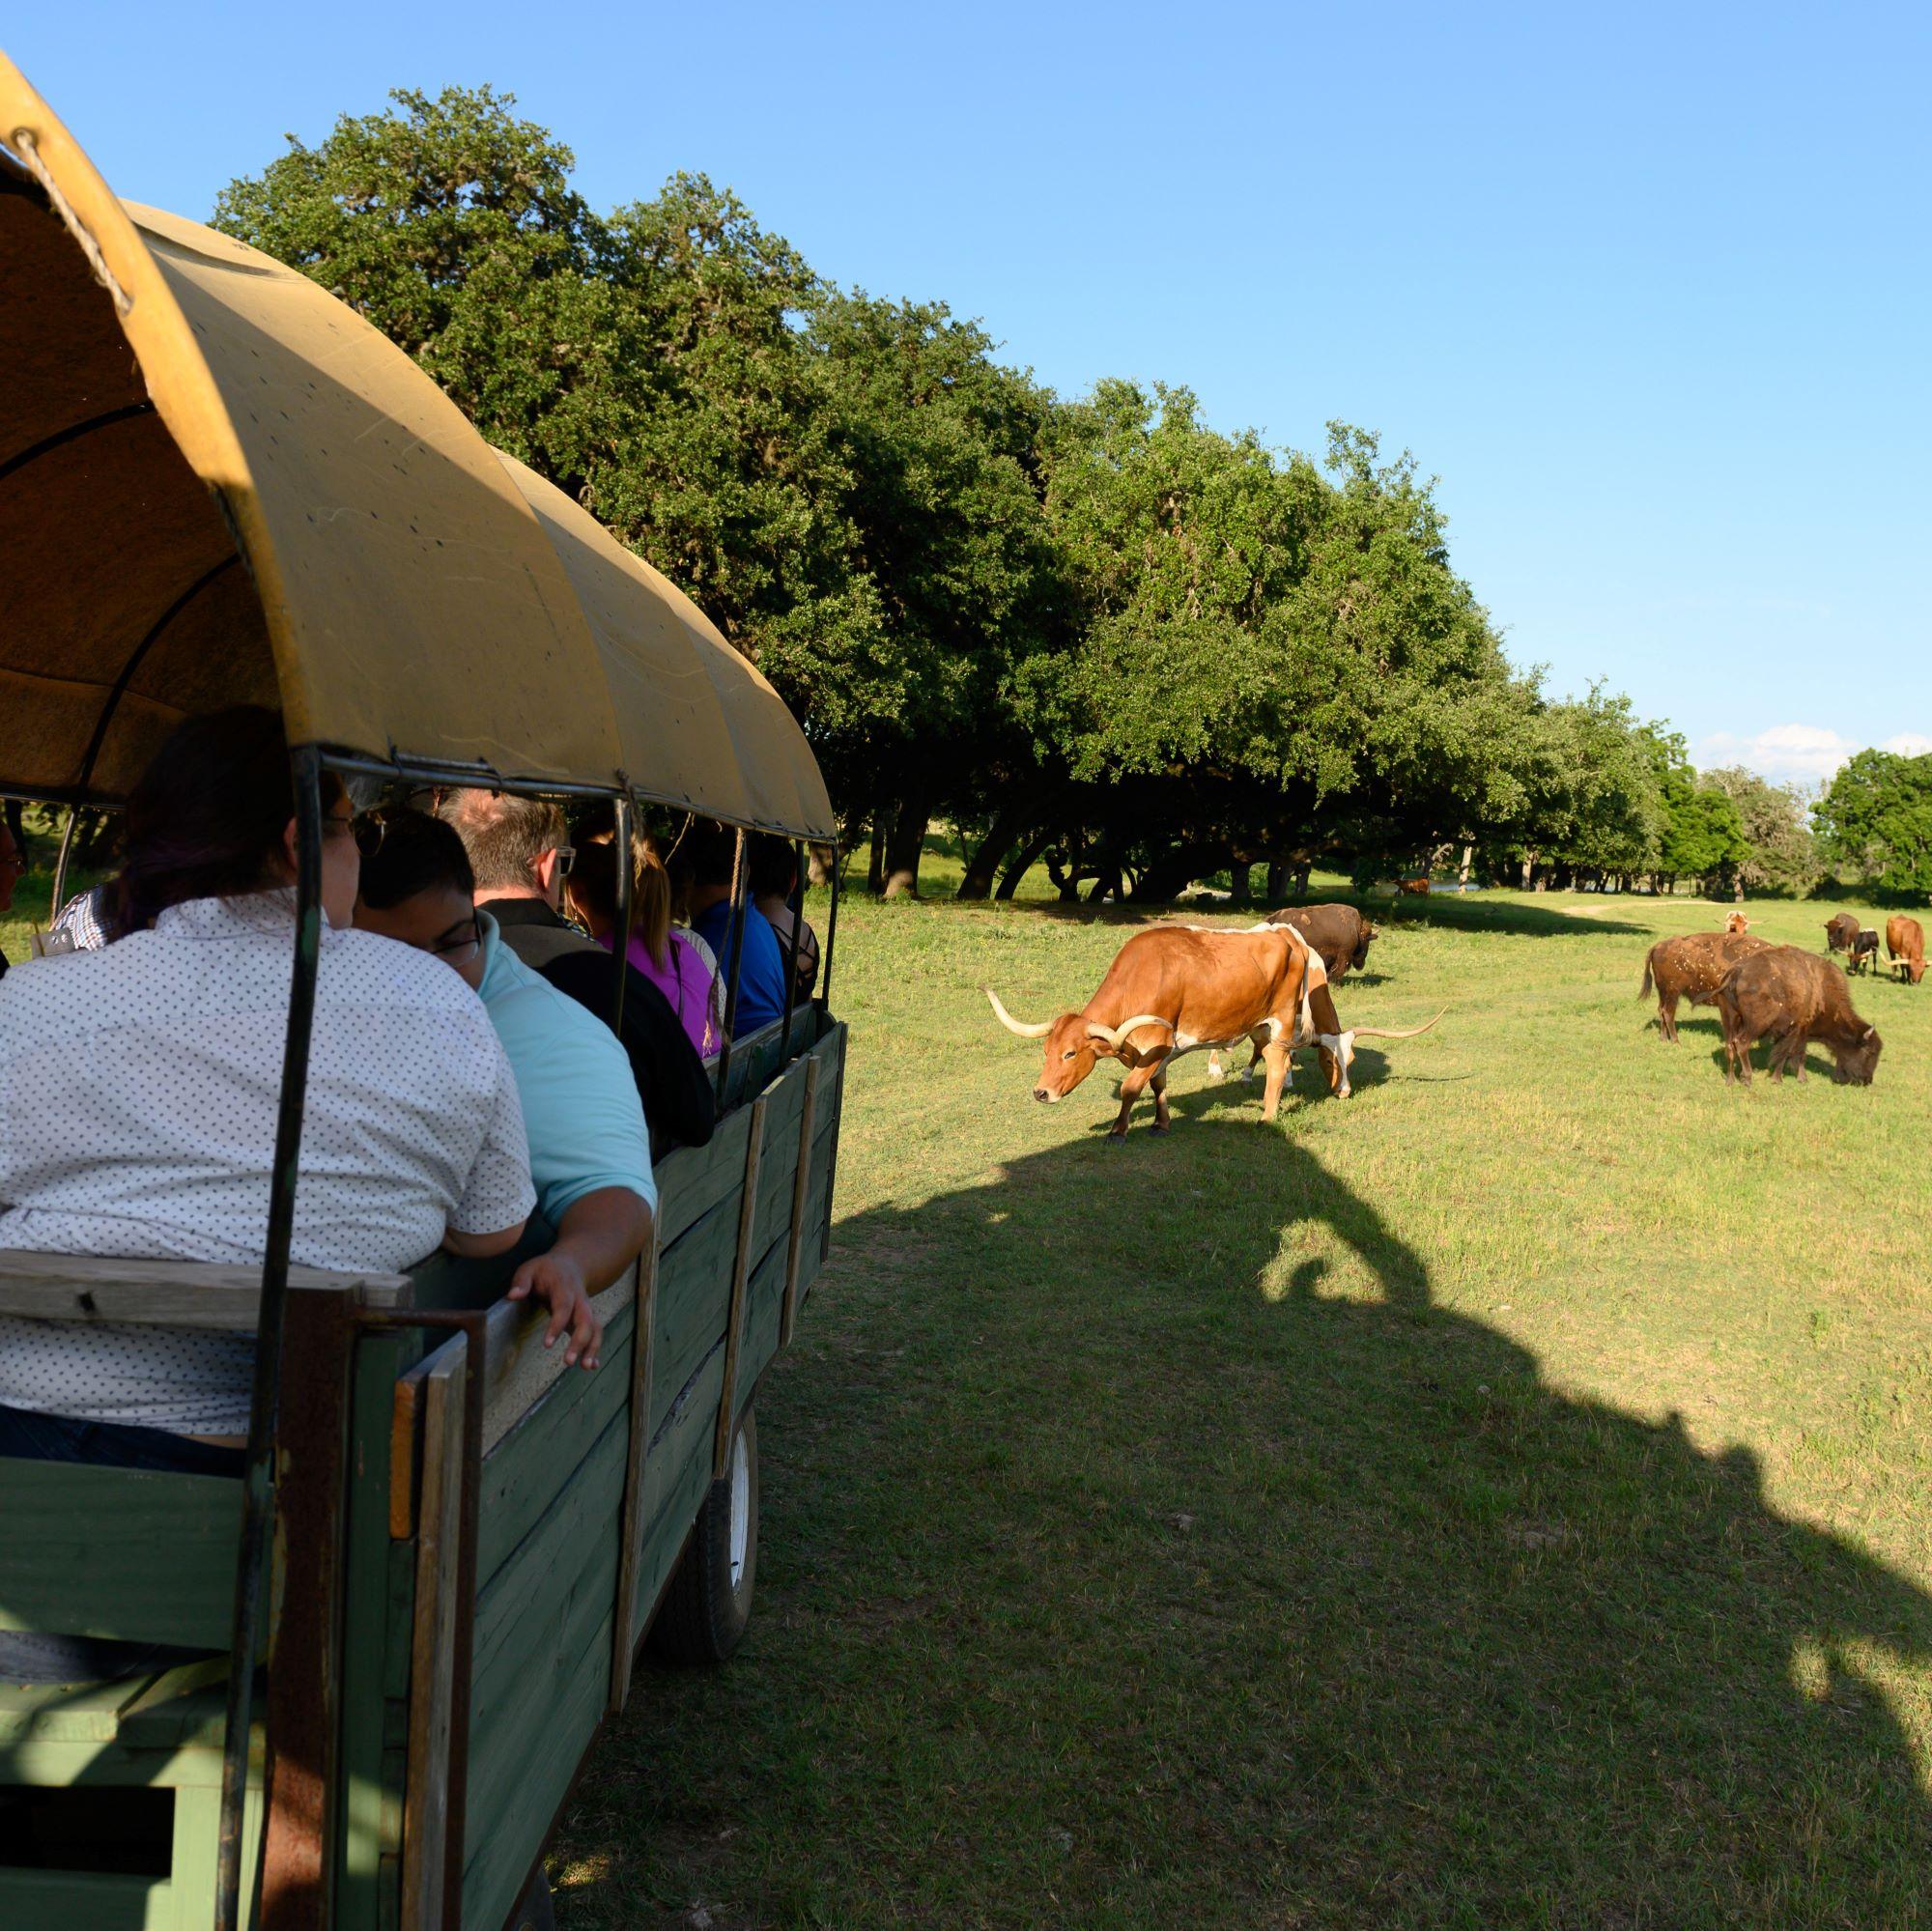 San Antonio Team Building Retreat Corporate Event Venue Covered Wagon Ride Activity